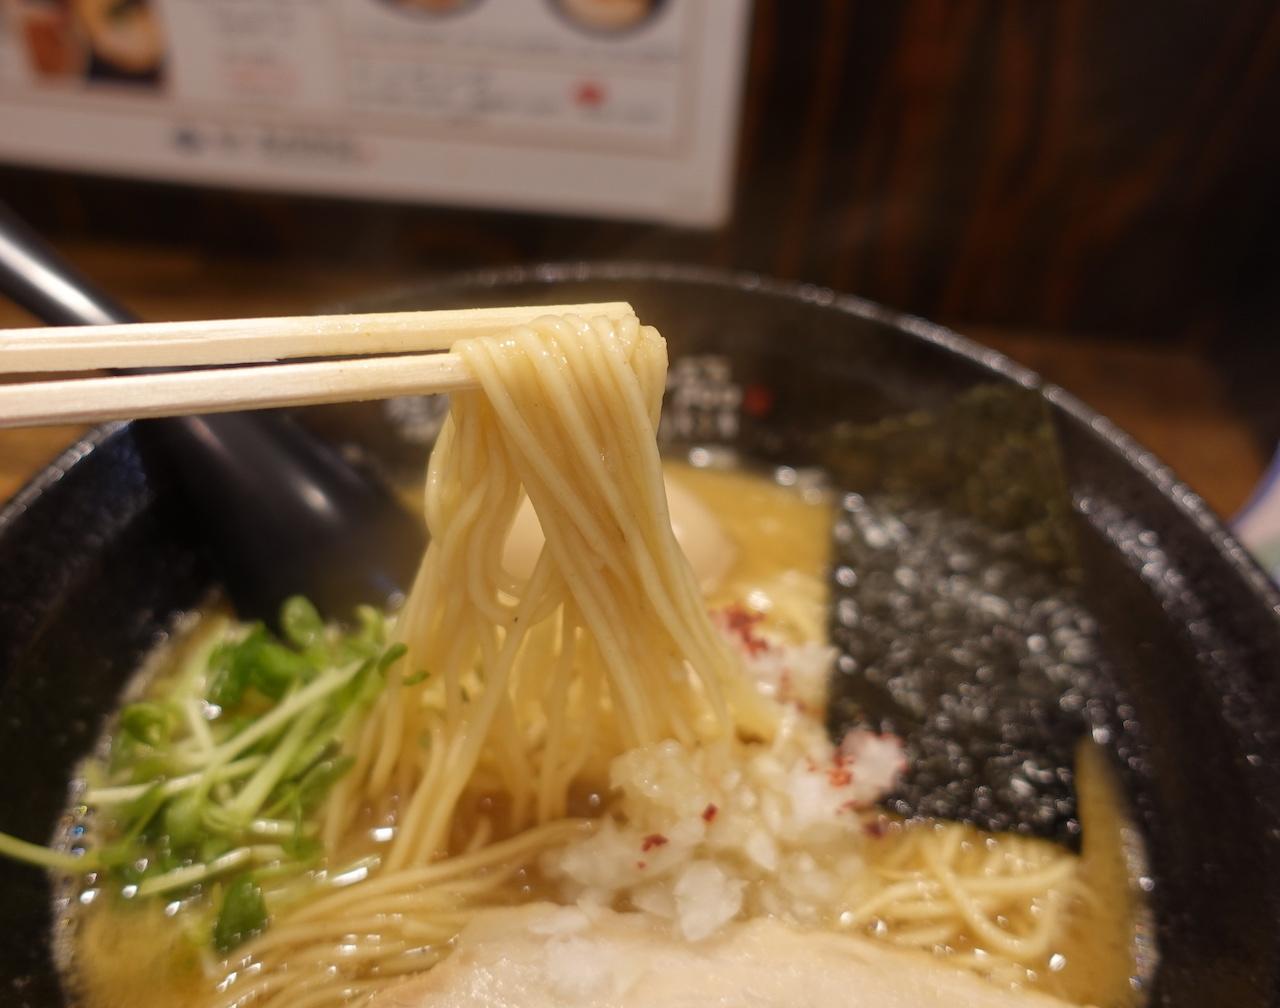 JANOG44@神戸出張 2日目。天孫降臨でラーメン食べて神戸ポートタワーに登る!_b0024832_23074182.jpg